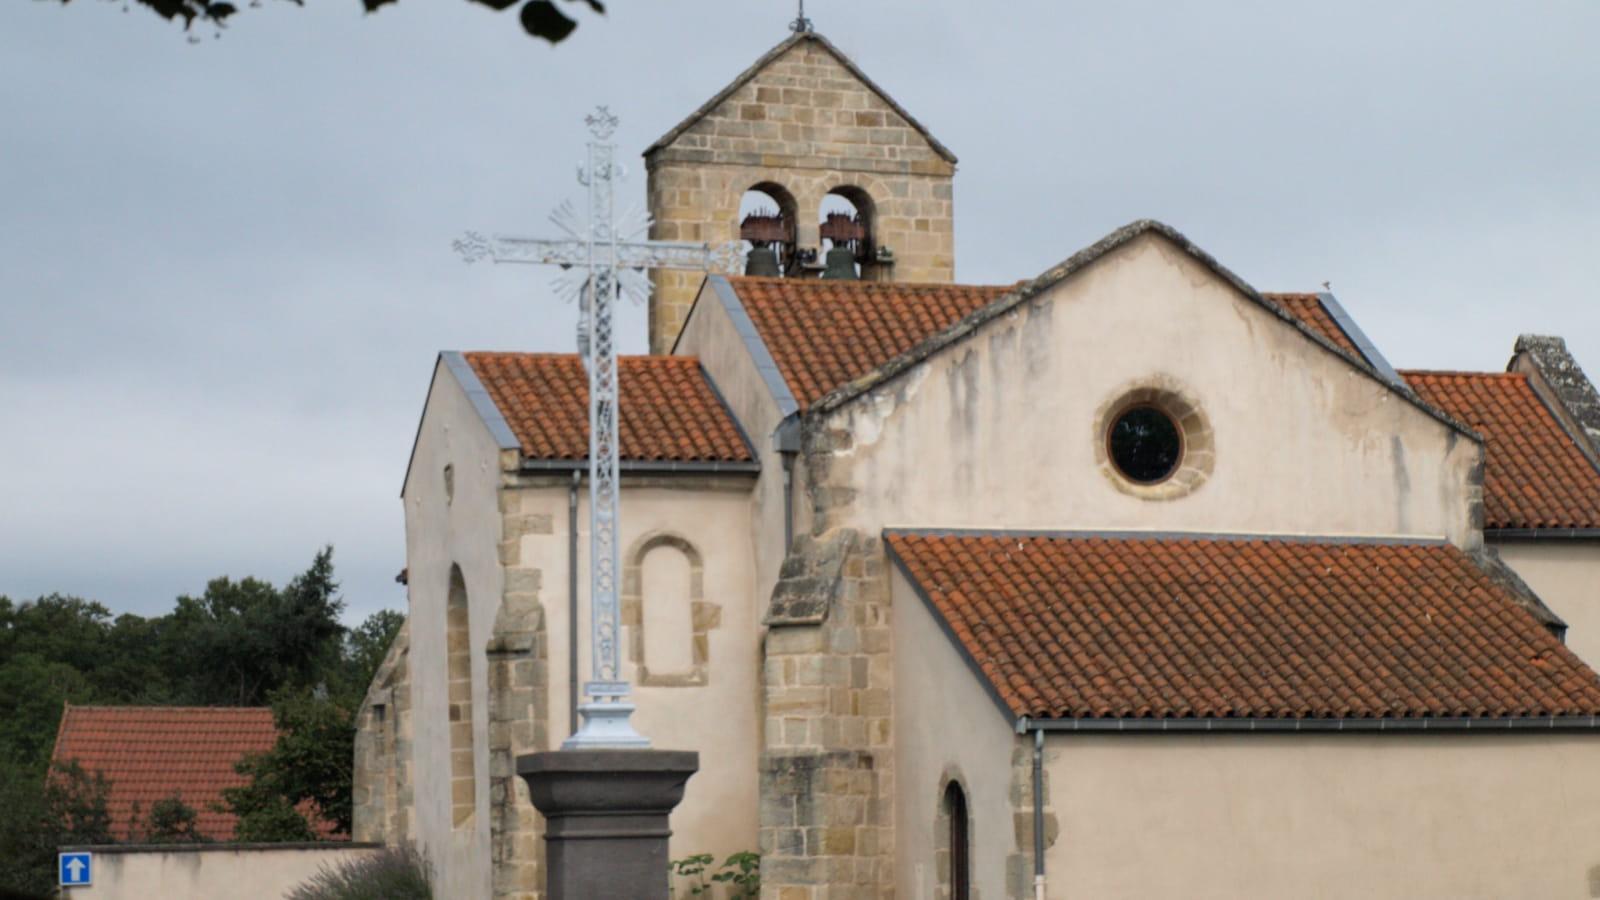 Saint-Maigner